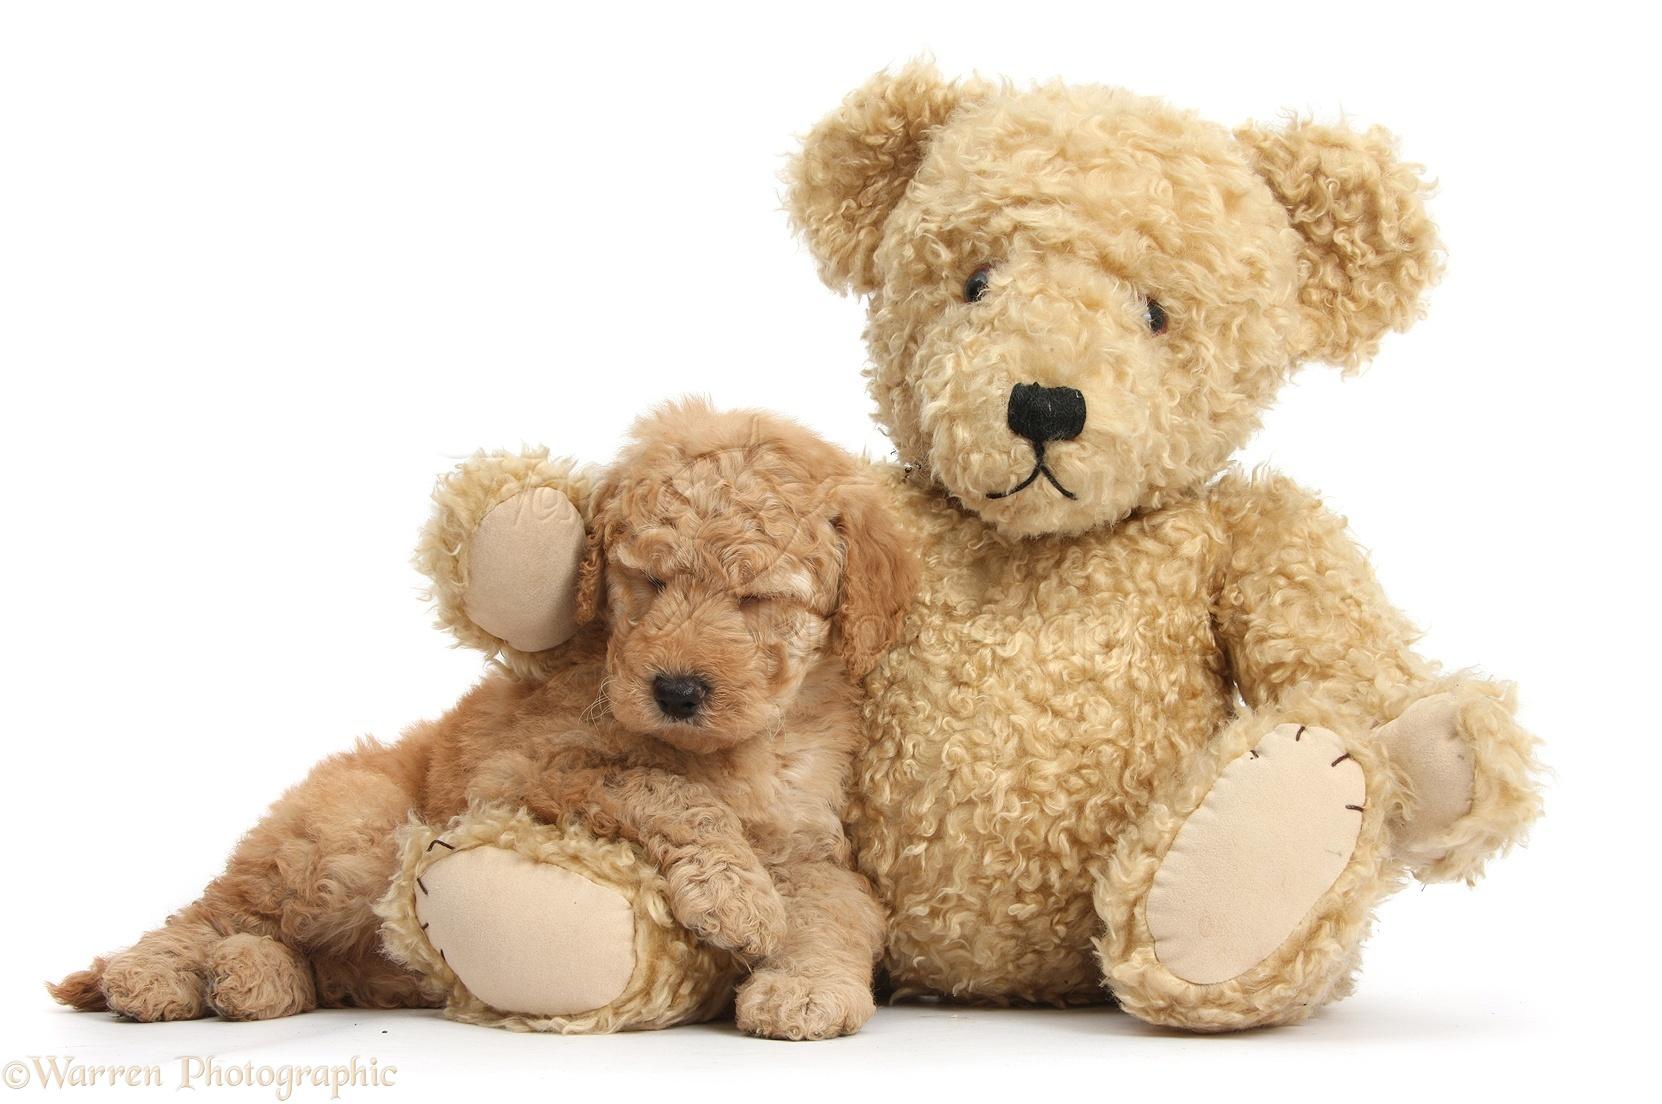 Dog Cute Toy Goldendoodle Puppy Sleeping On Teddy Bear Photo Wp38424